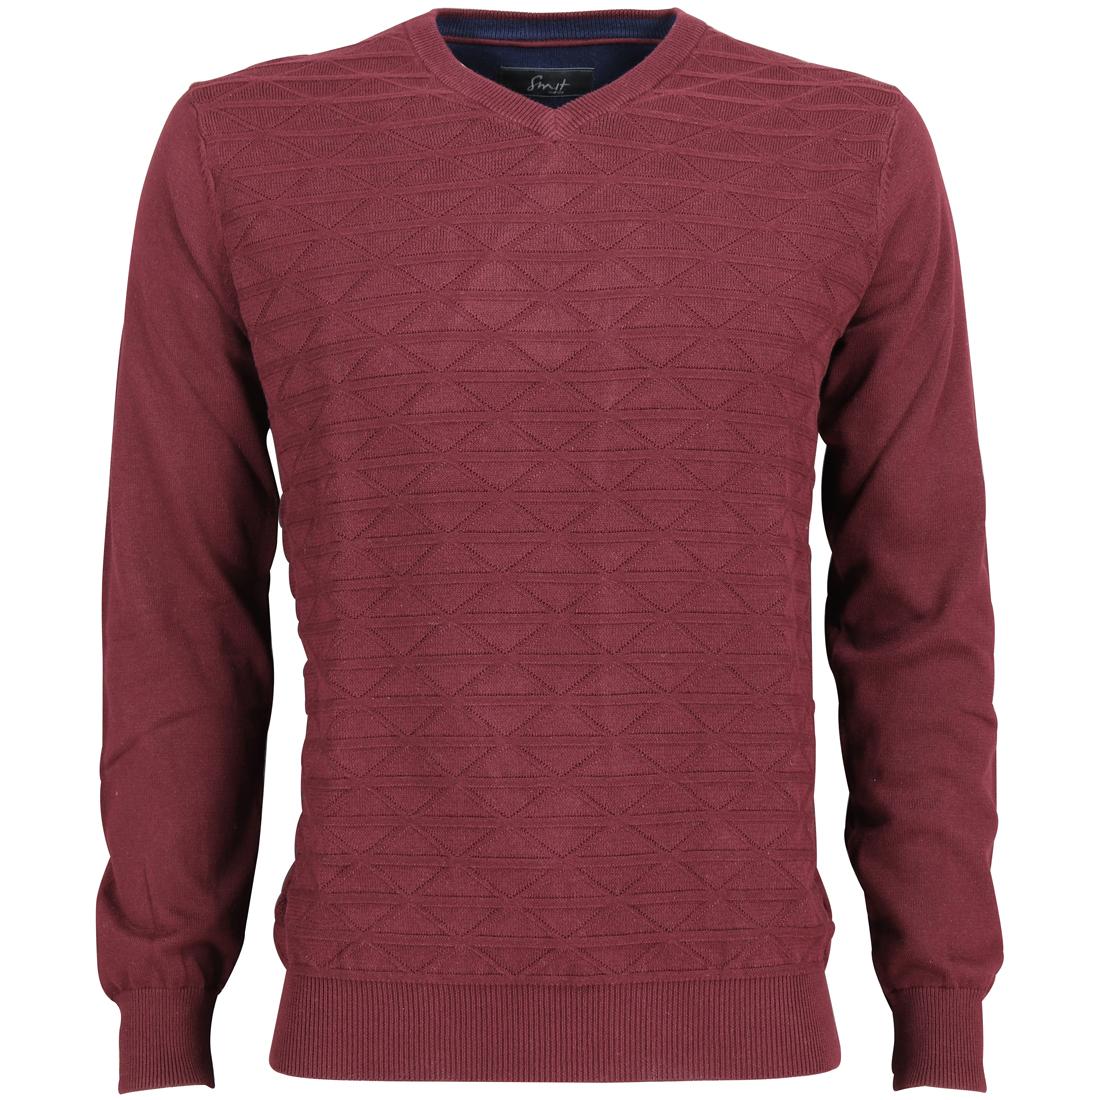 Smit Mode trui 82-8106-6 in het Donker Rood